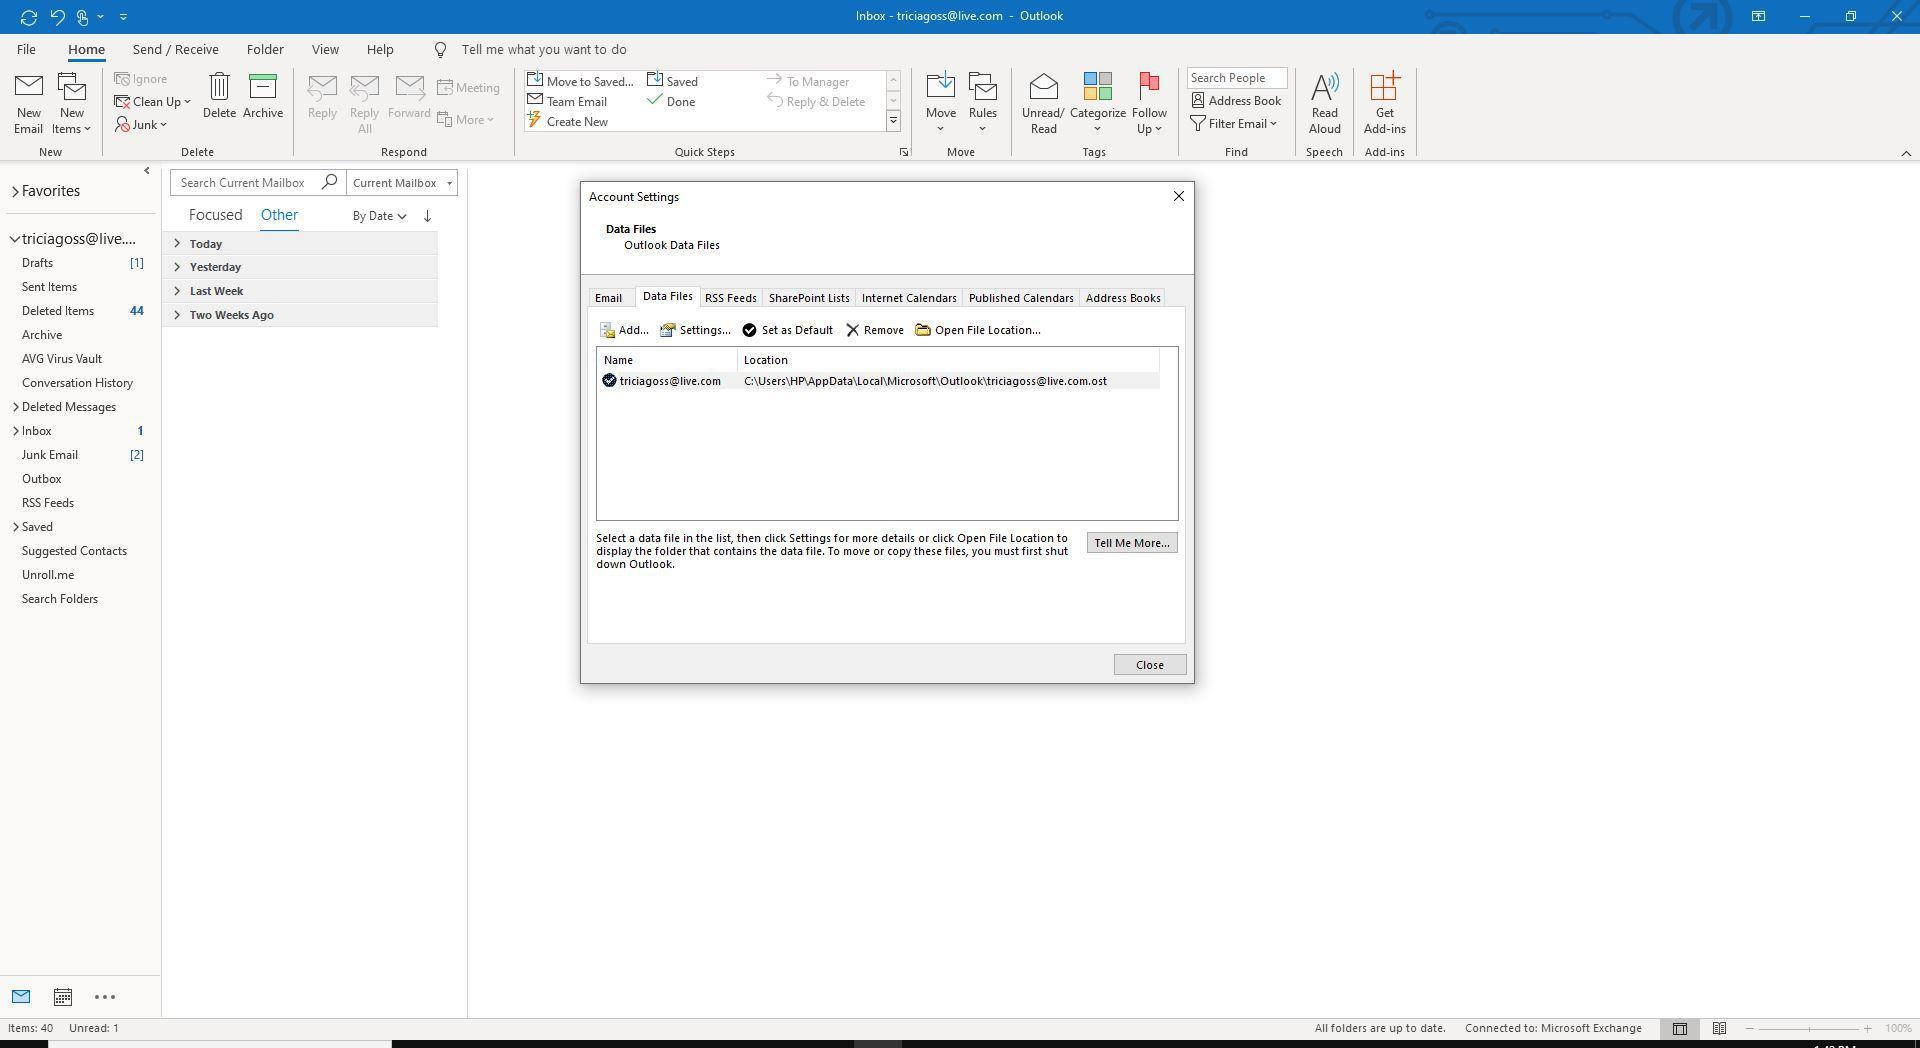 Screenshot of Data Files tab on Account Settings